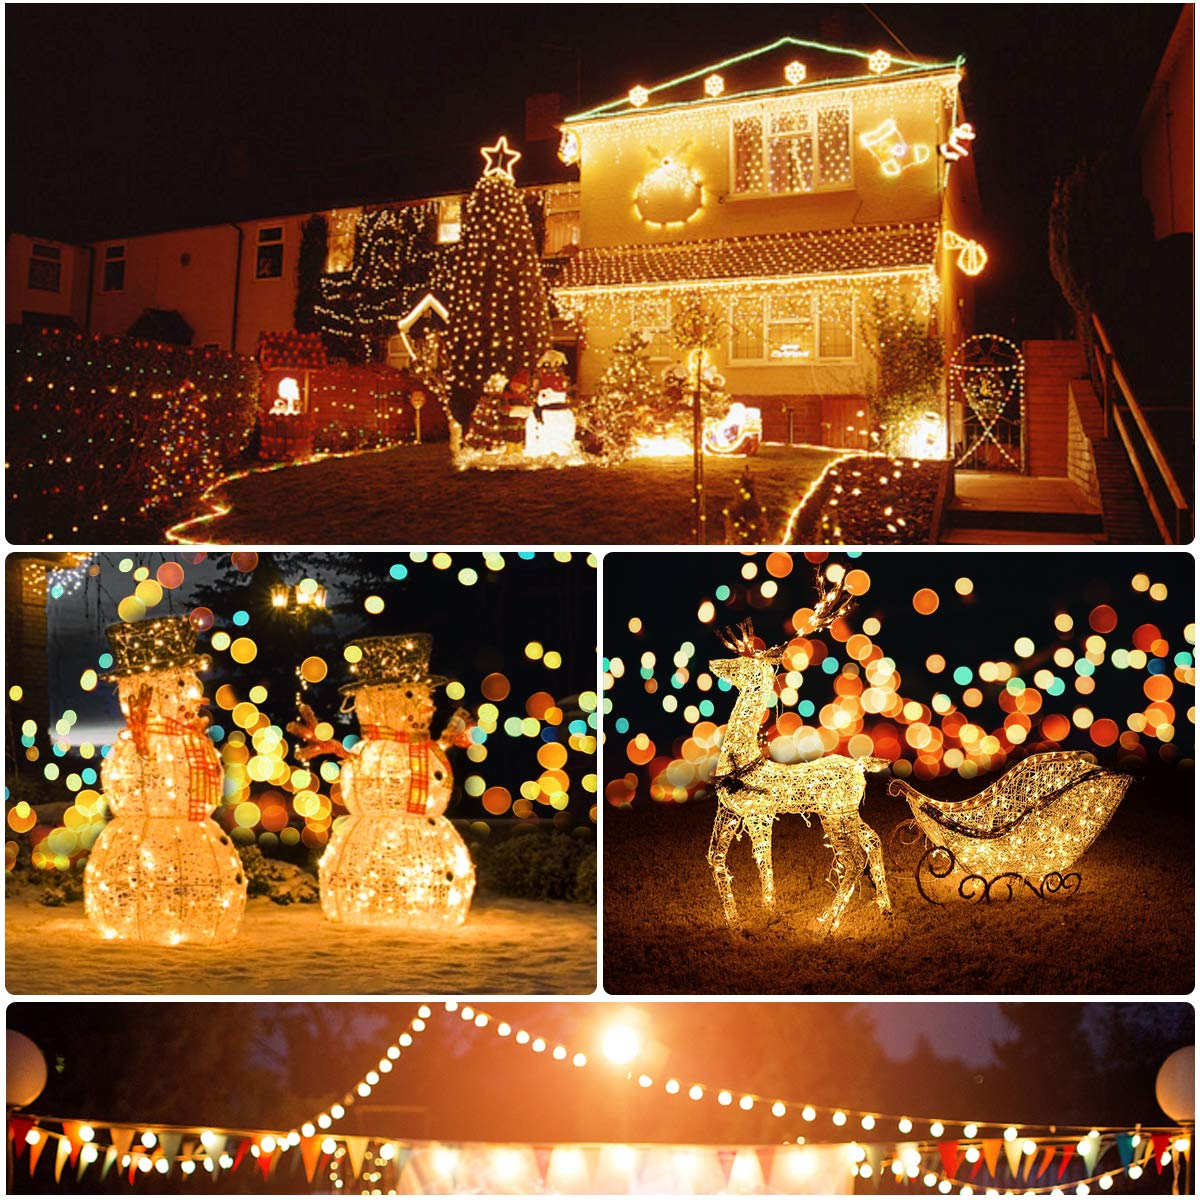 Morpilot Solar String Lights, 33ft 200LED Outdoor String Lights, Waterproof Decorative String Lights for Patio, Garden, Gate, Yard, Party, Wedding, Christmas (Warm White)